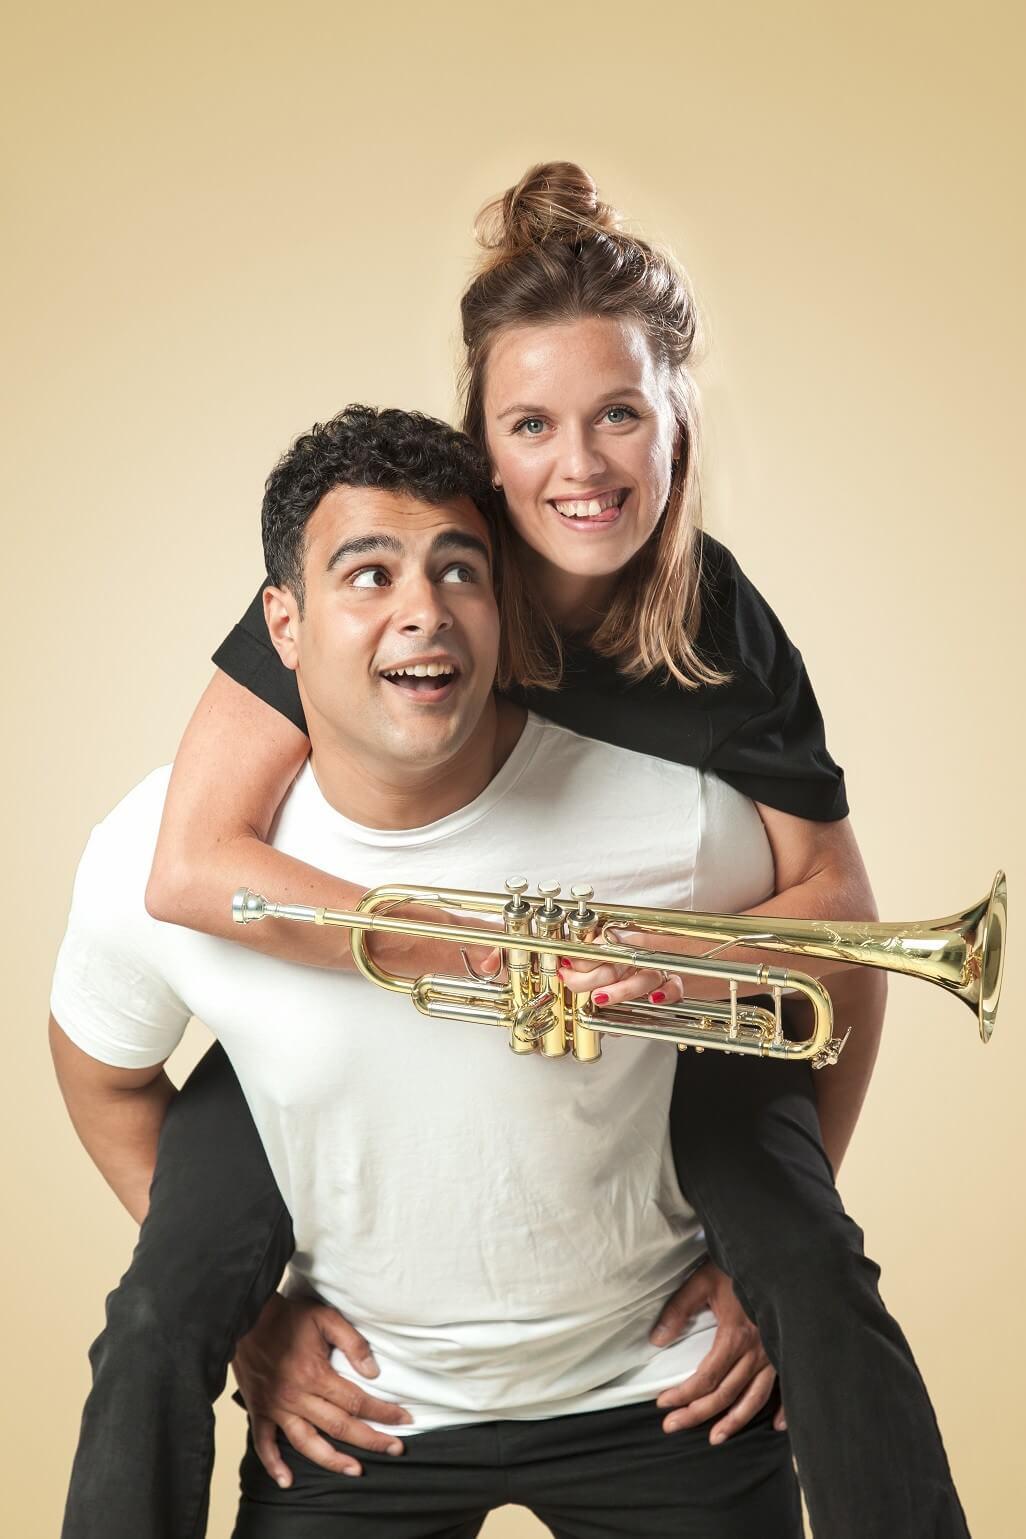 Ali & Nino - Theatergroep Witte Raaf - Foto Casper Koster